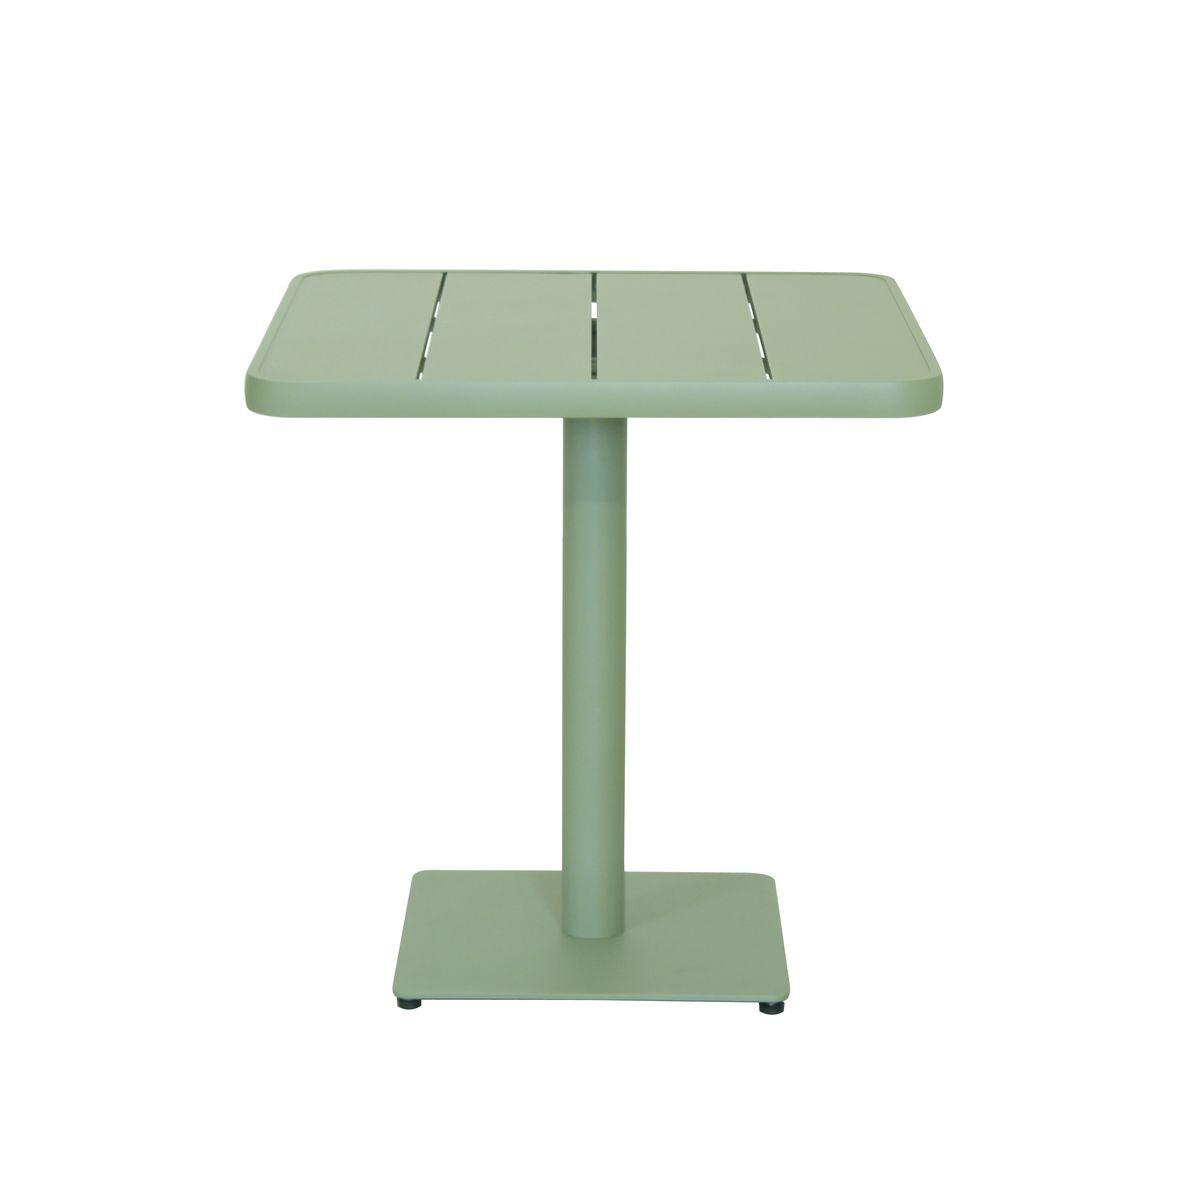 Table à manger extérieure en aluminium vert